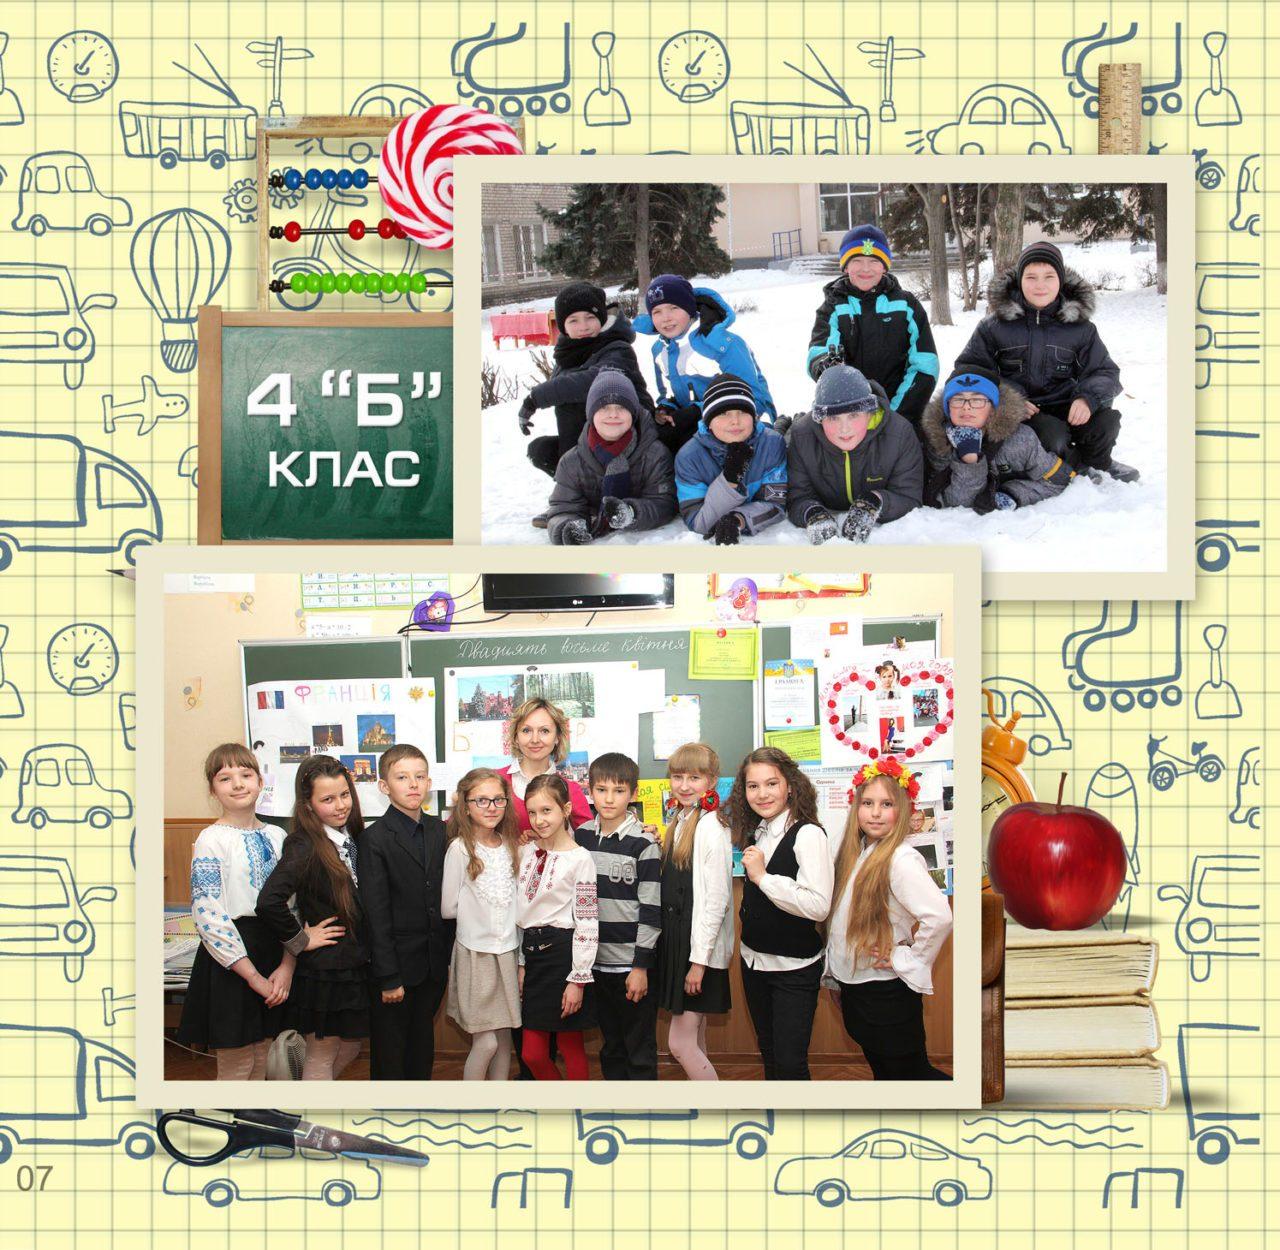 https://school-photo.com.ua/wp-content/uploads/2017/07/07-5-1280x1250.jpg